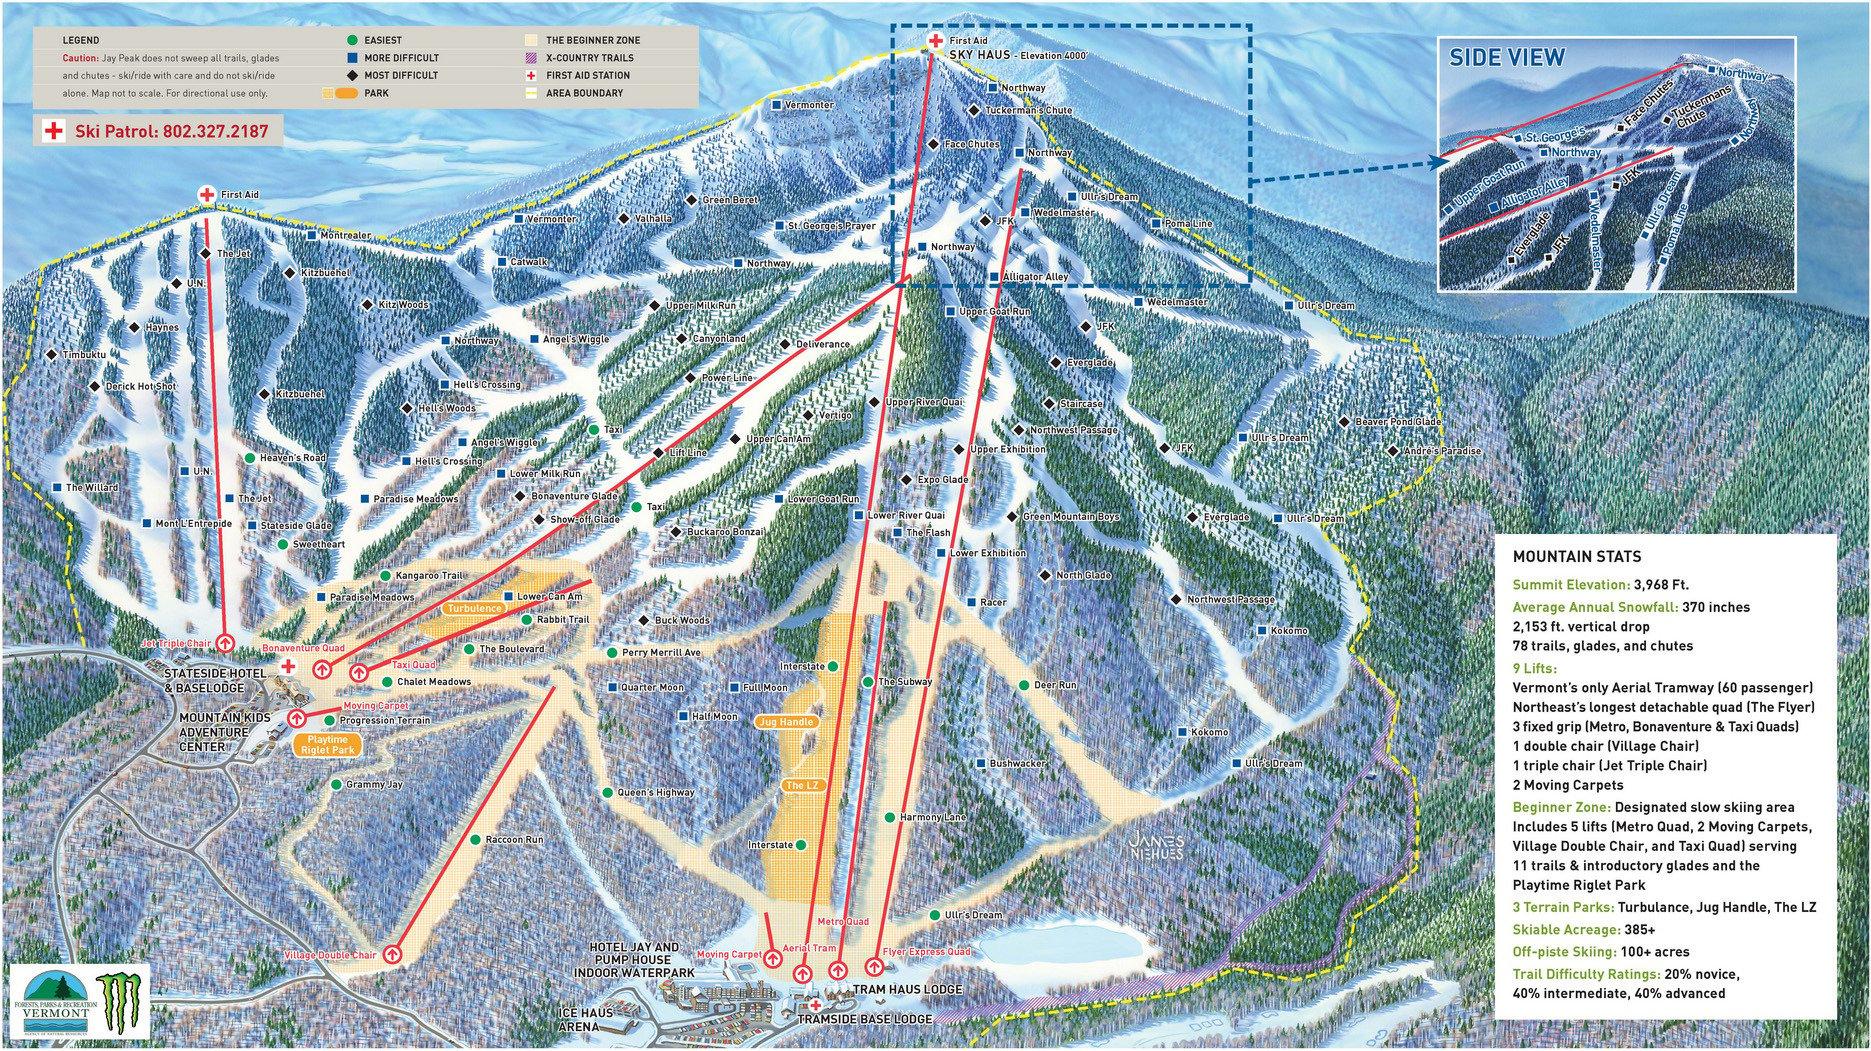 9a5821441 Jay Peak Skiing & Snowboarding Resort Guide | evo